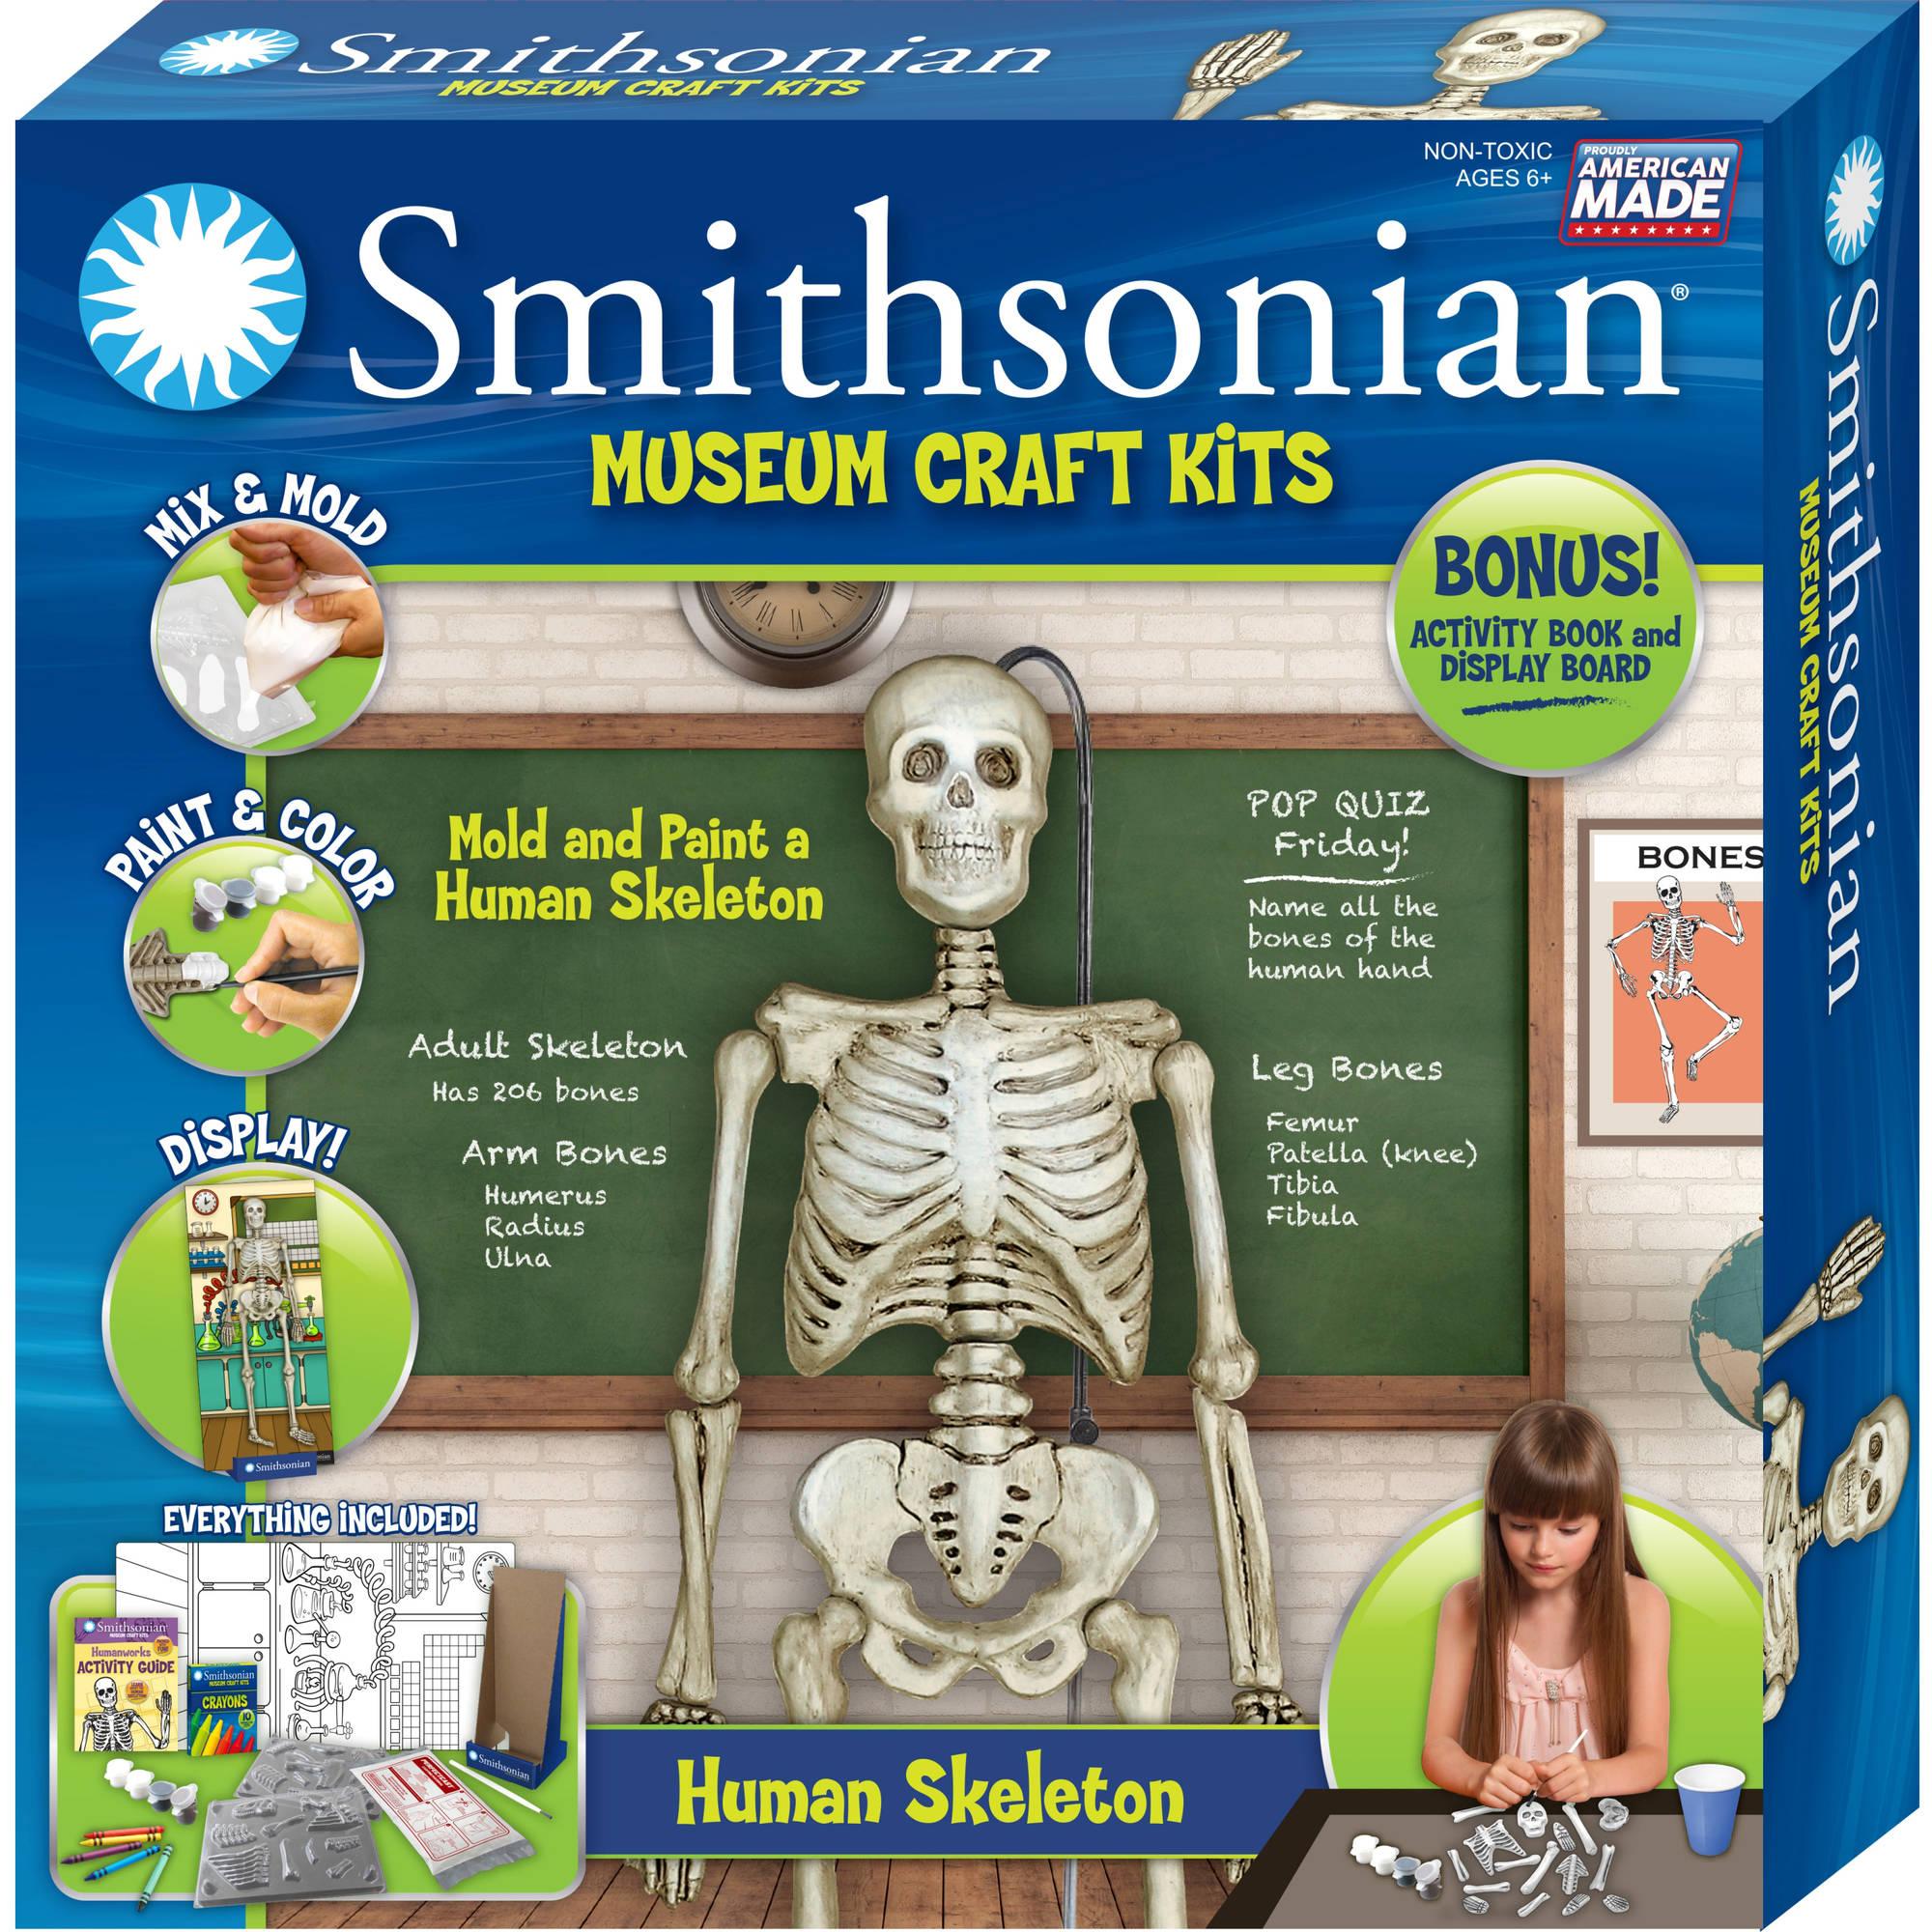 Smithsonian Museum Craft Kits, Human